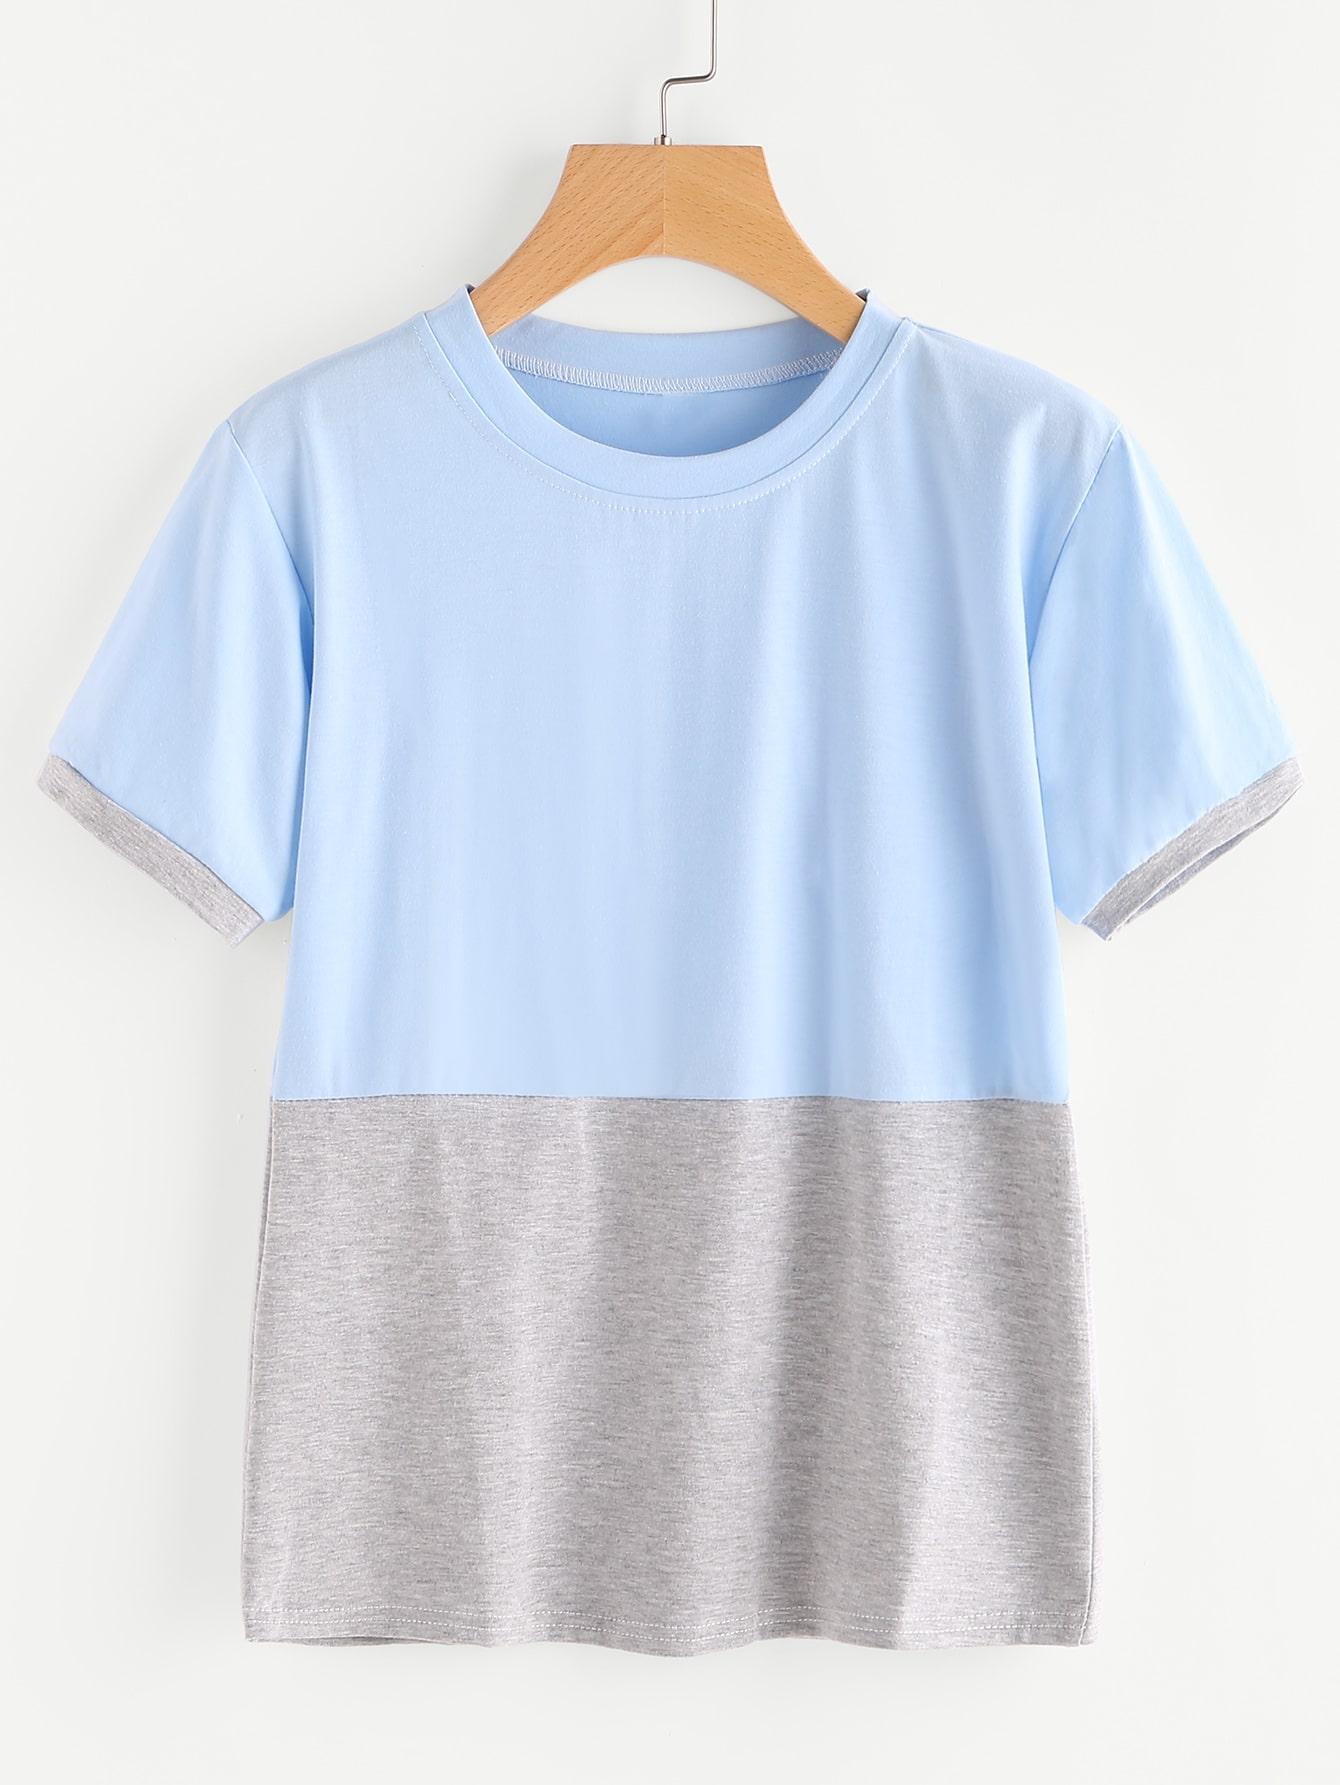 Фото Contrast Cut And Sew T-shirt. Купить с доставкой